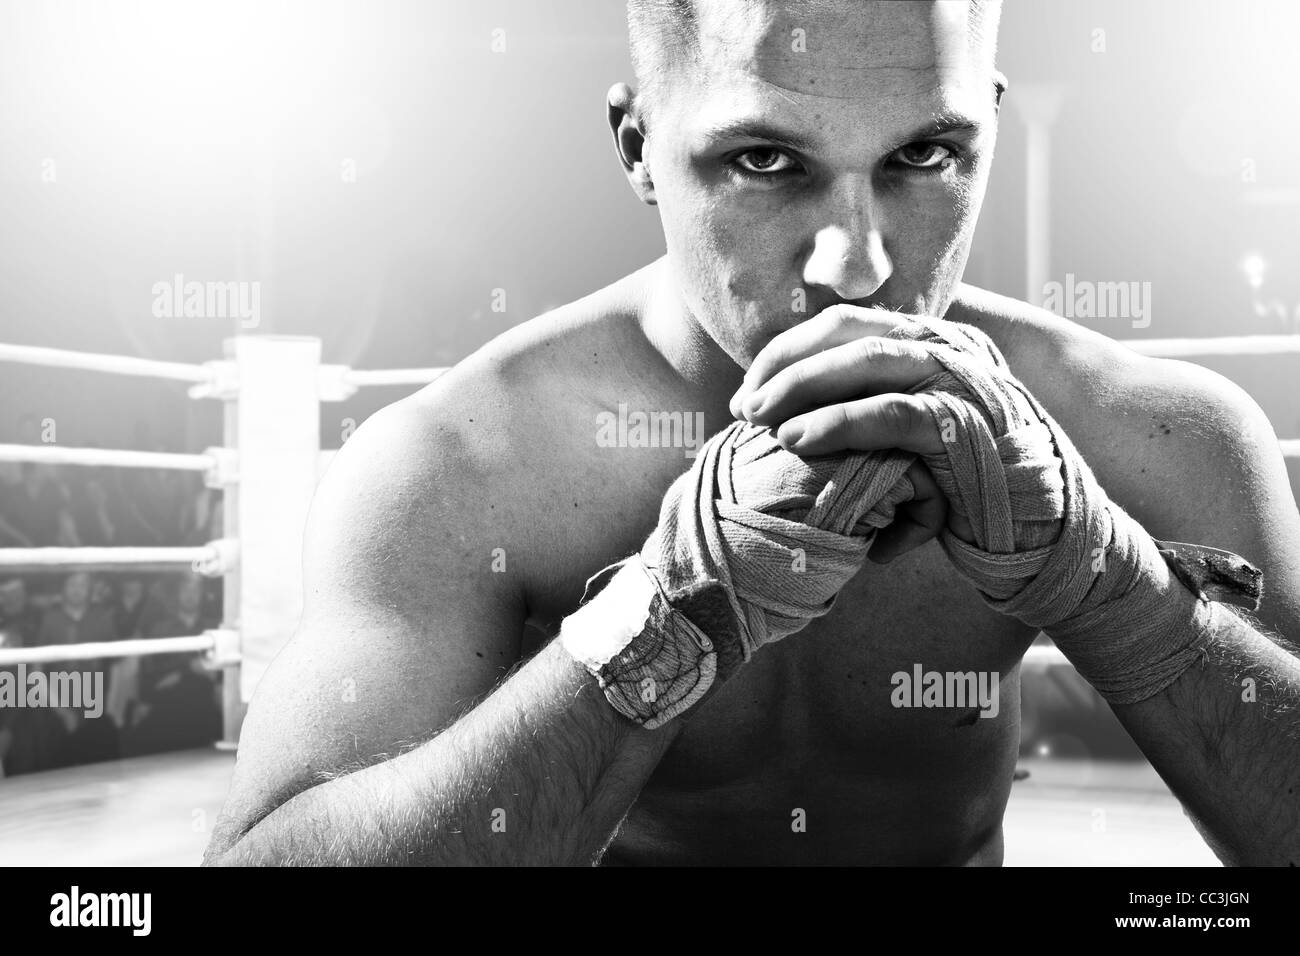 Kickboxer sitting  on the fighting ring - Stock Image